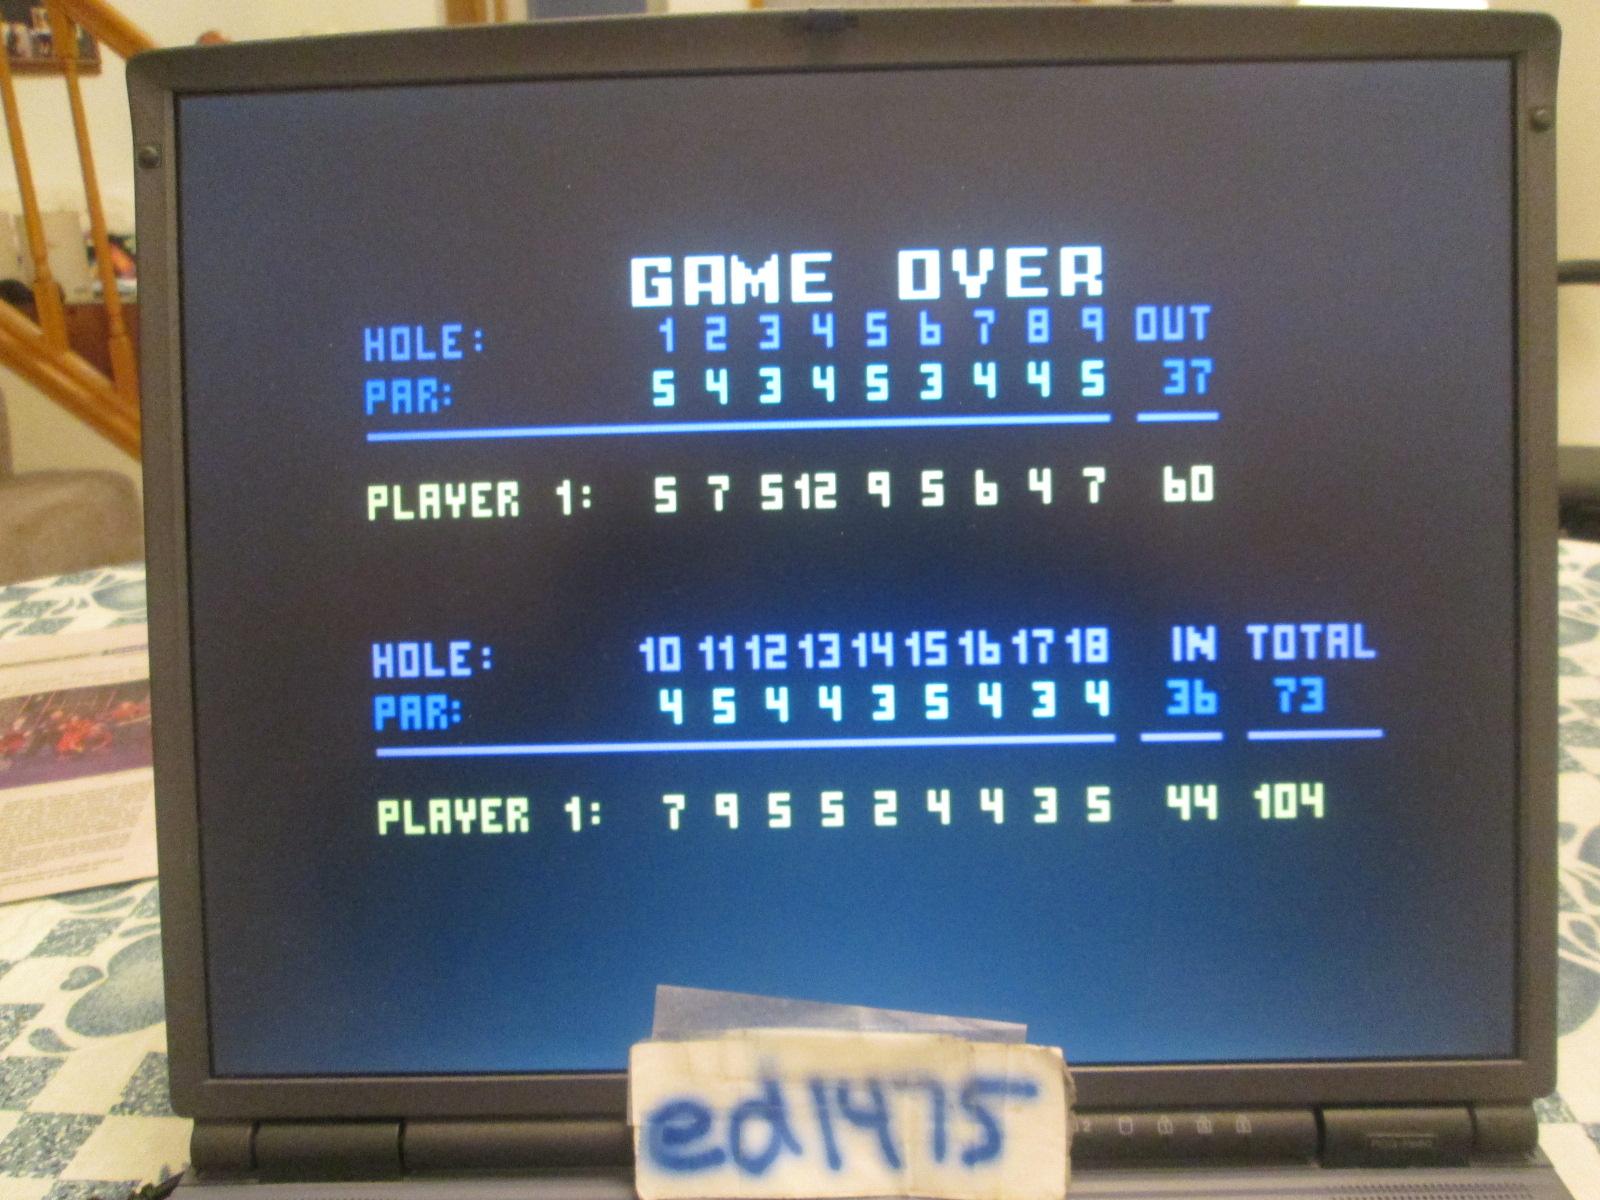 ed1475: Chip Shot: Super Pro Golf [Celebrity Pro-Am: 18 Holes] (Intellivision Emulated) 104 points on 2018-10-17 22:44:45